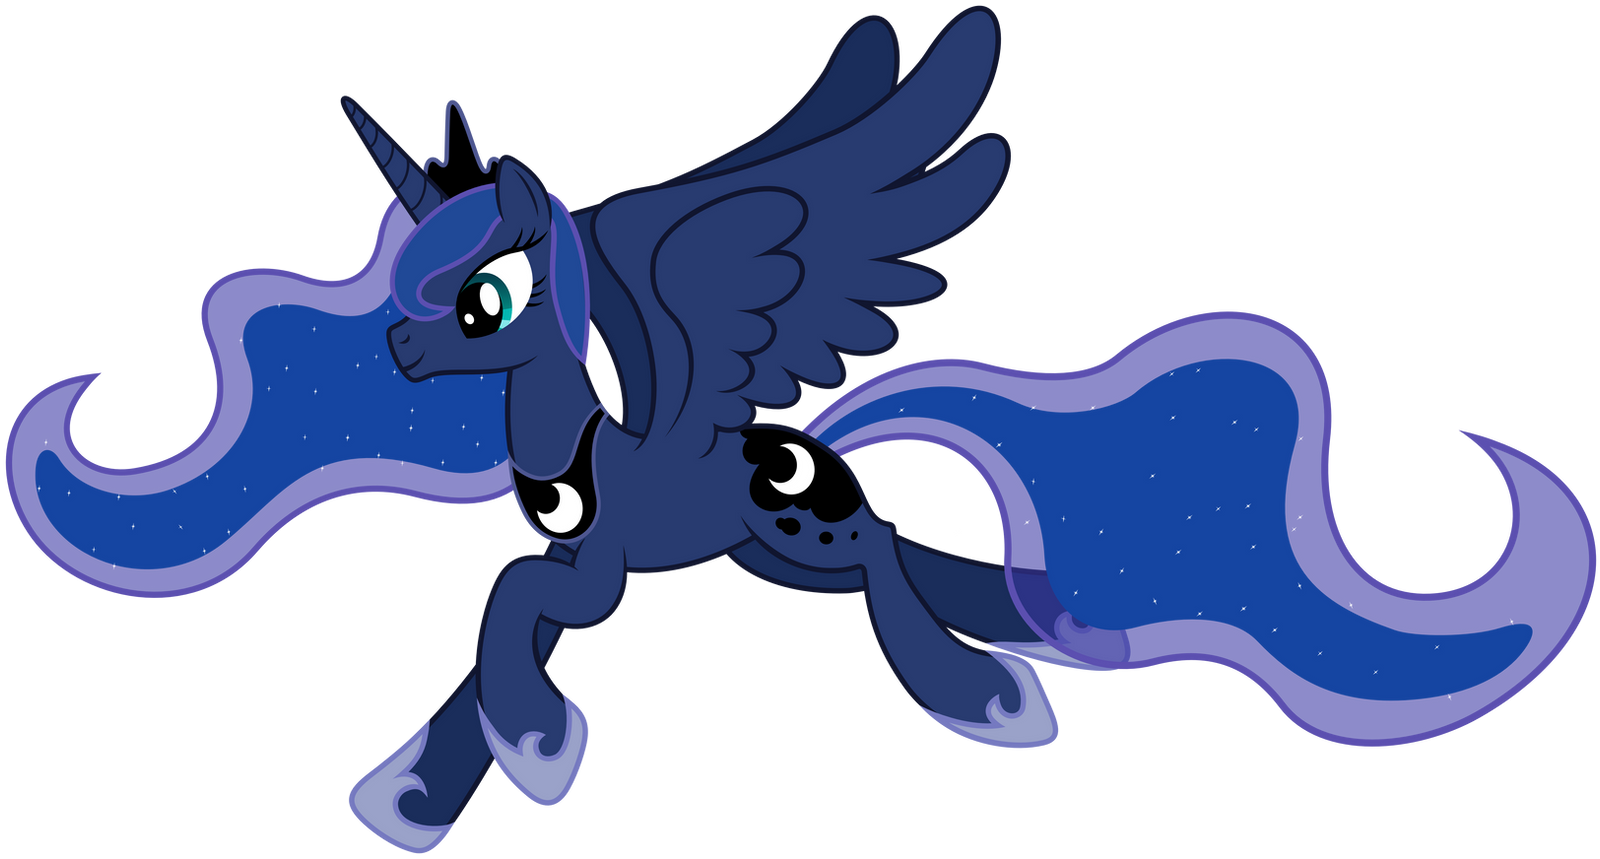 Flying Luna